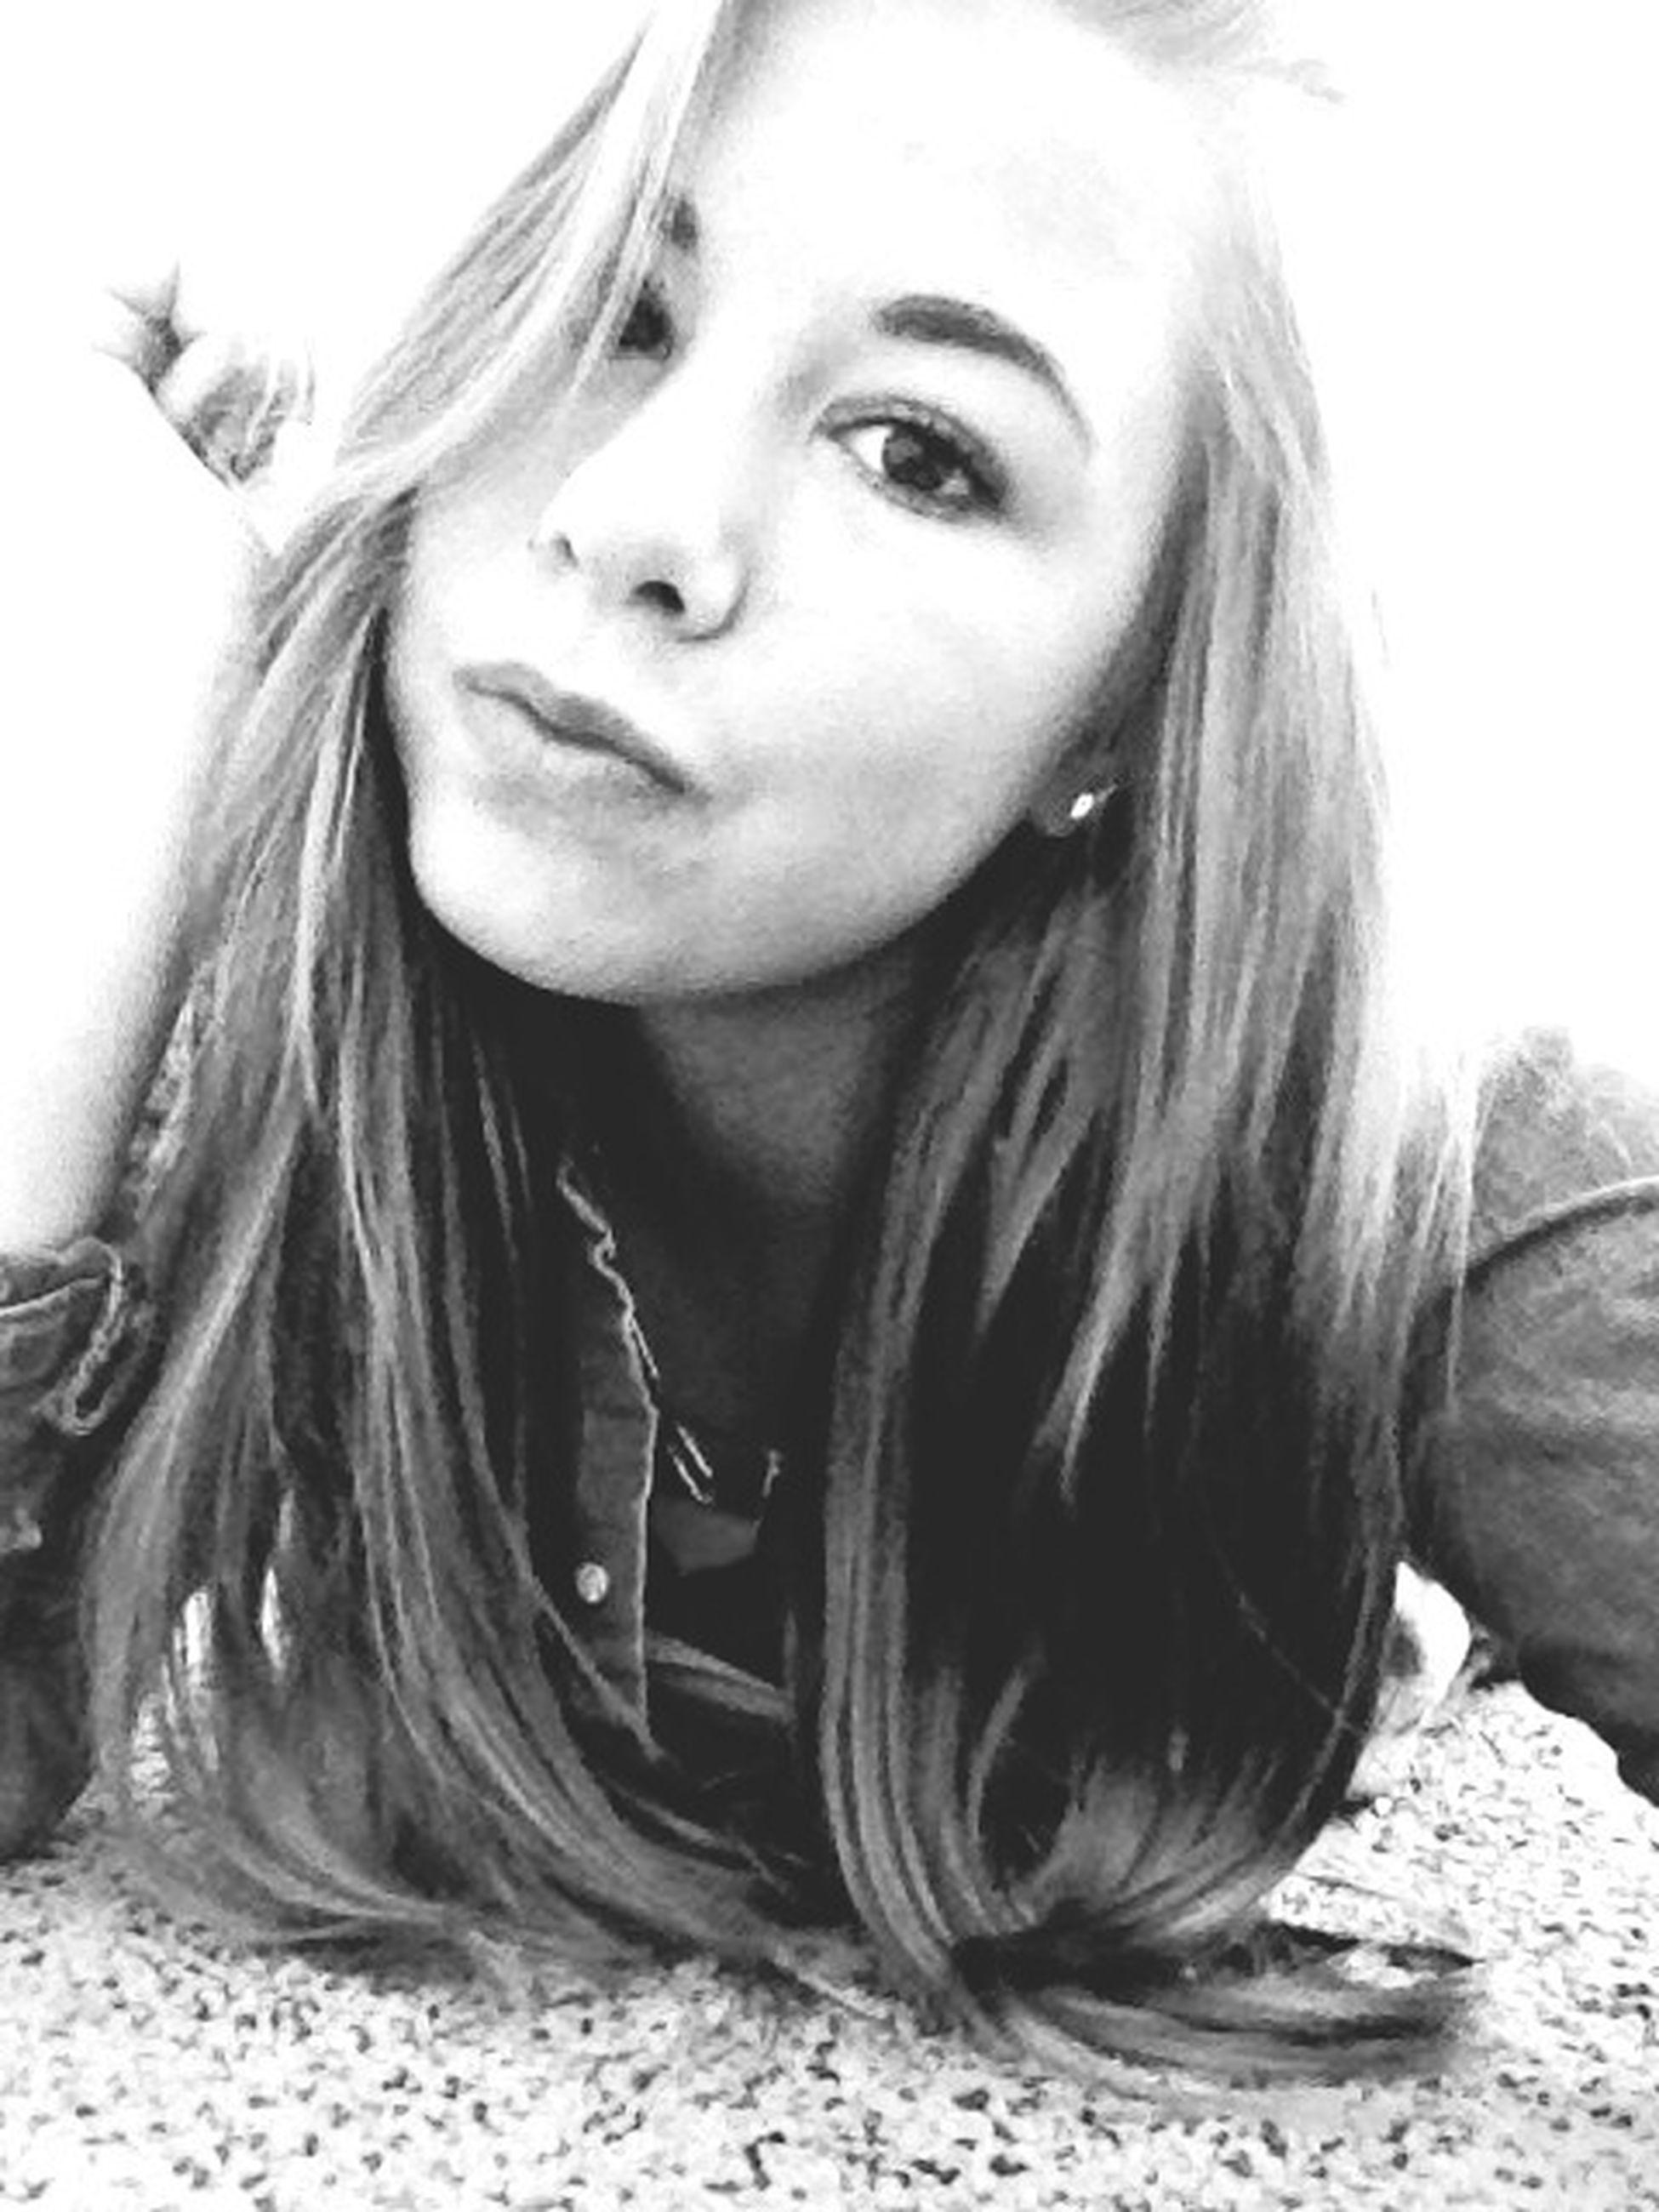 Selfie Wednesday